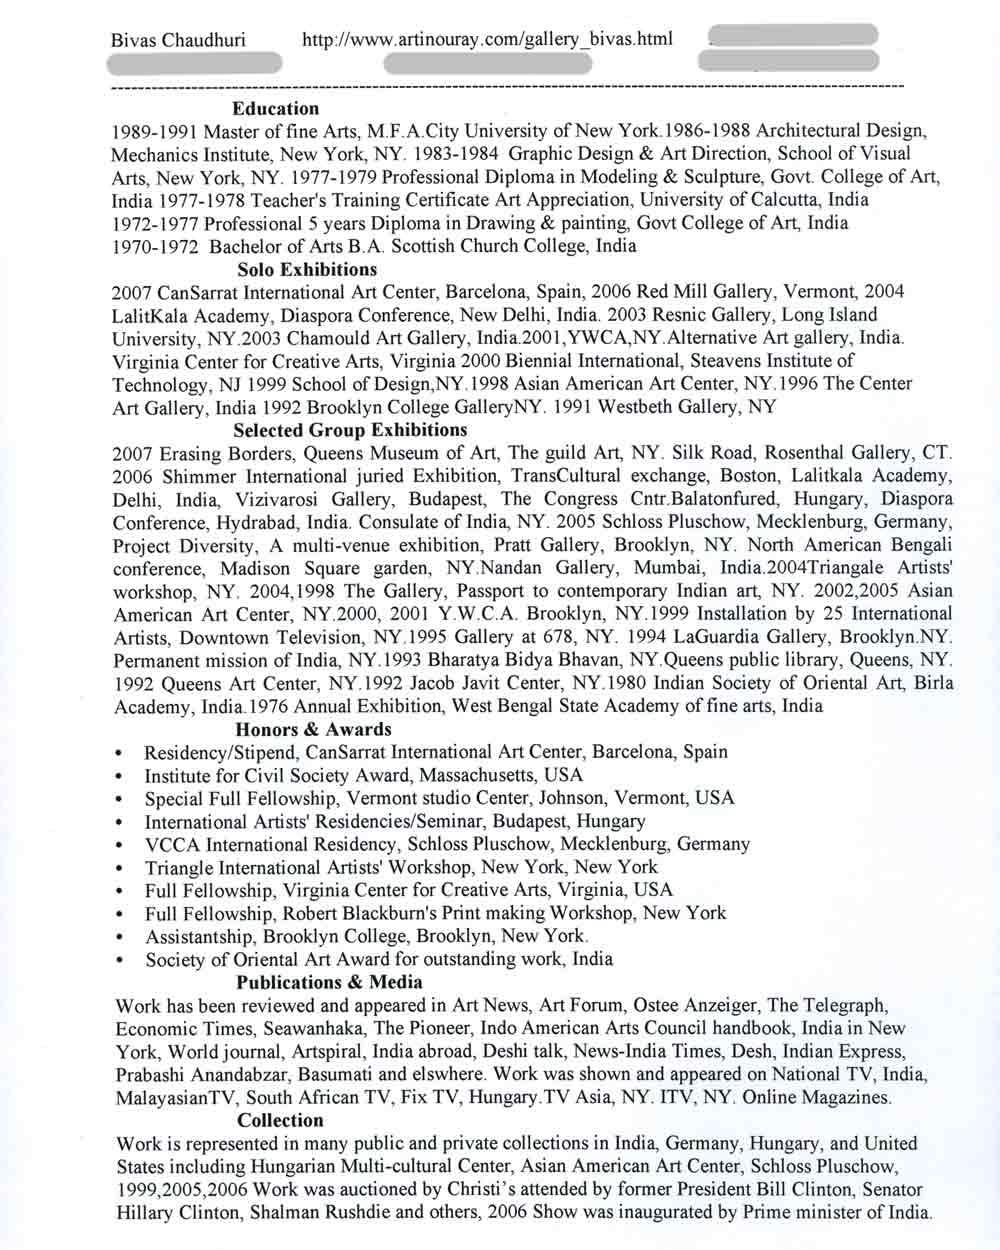 Bivas Chauduri's Resume, pg 1